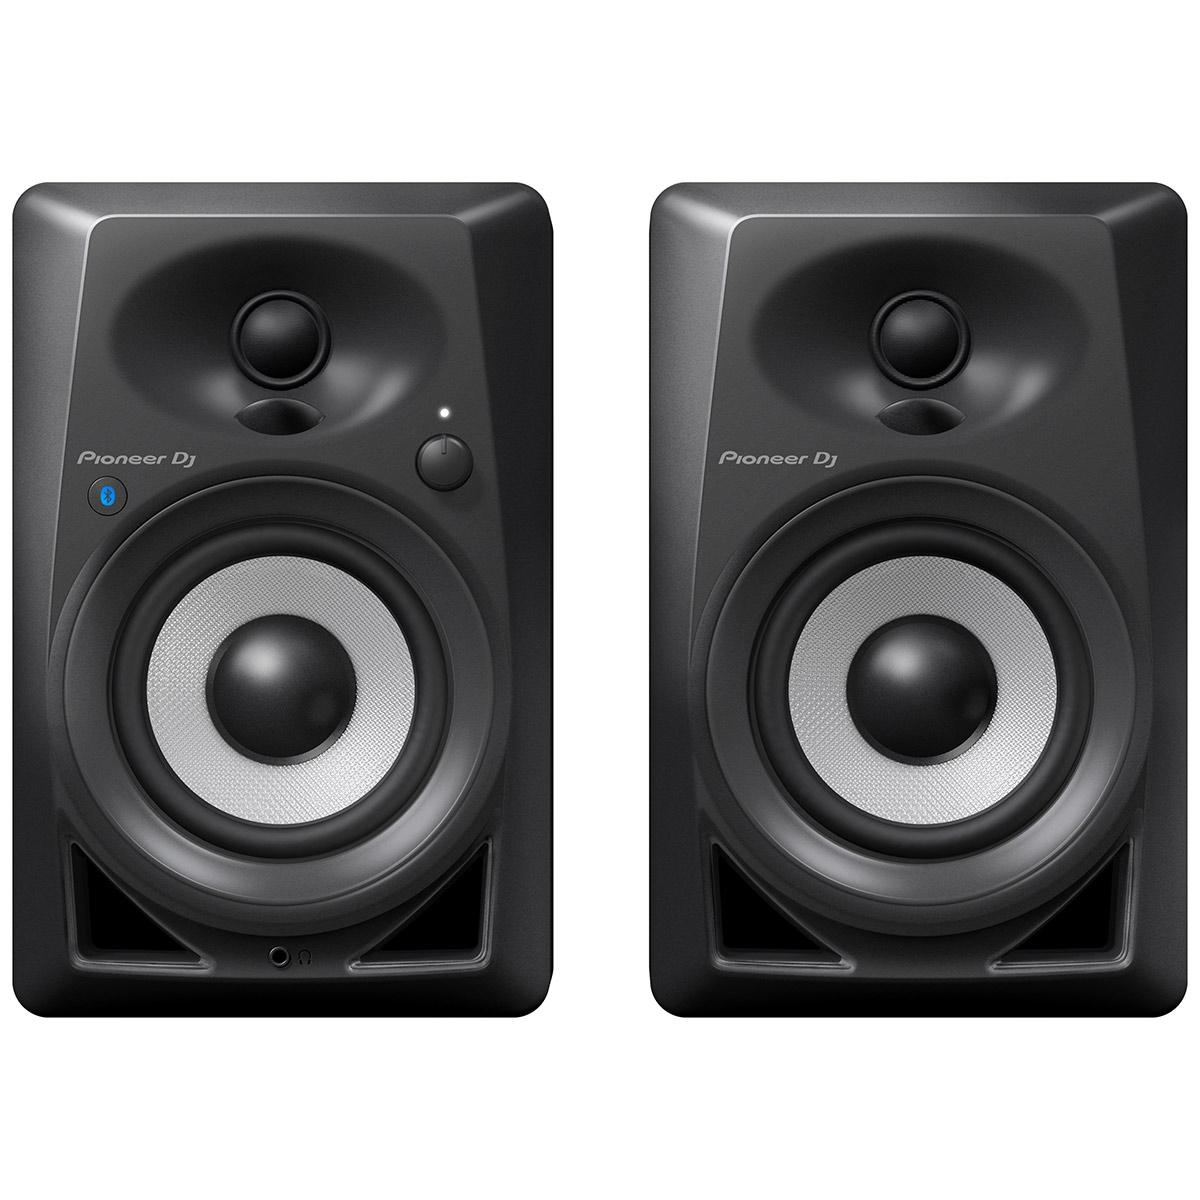 Enceintes de monitoring Bluetooth DM-40BT - Pioneer DJ